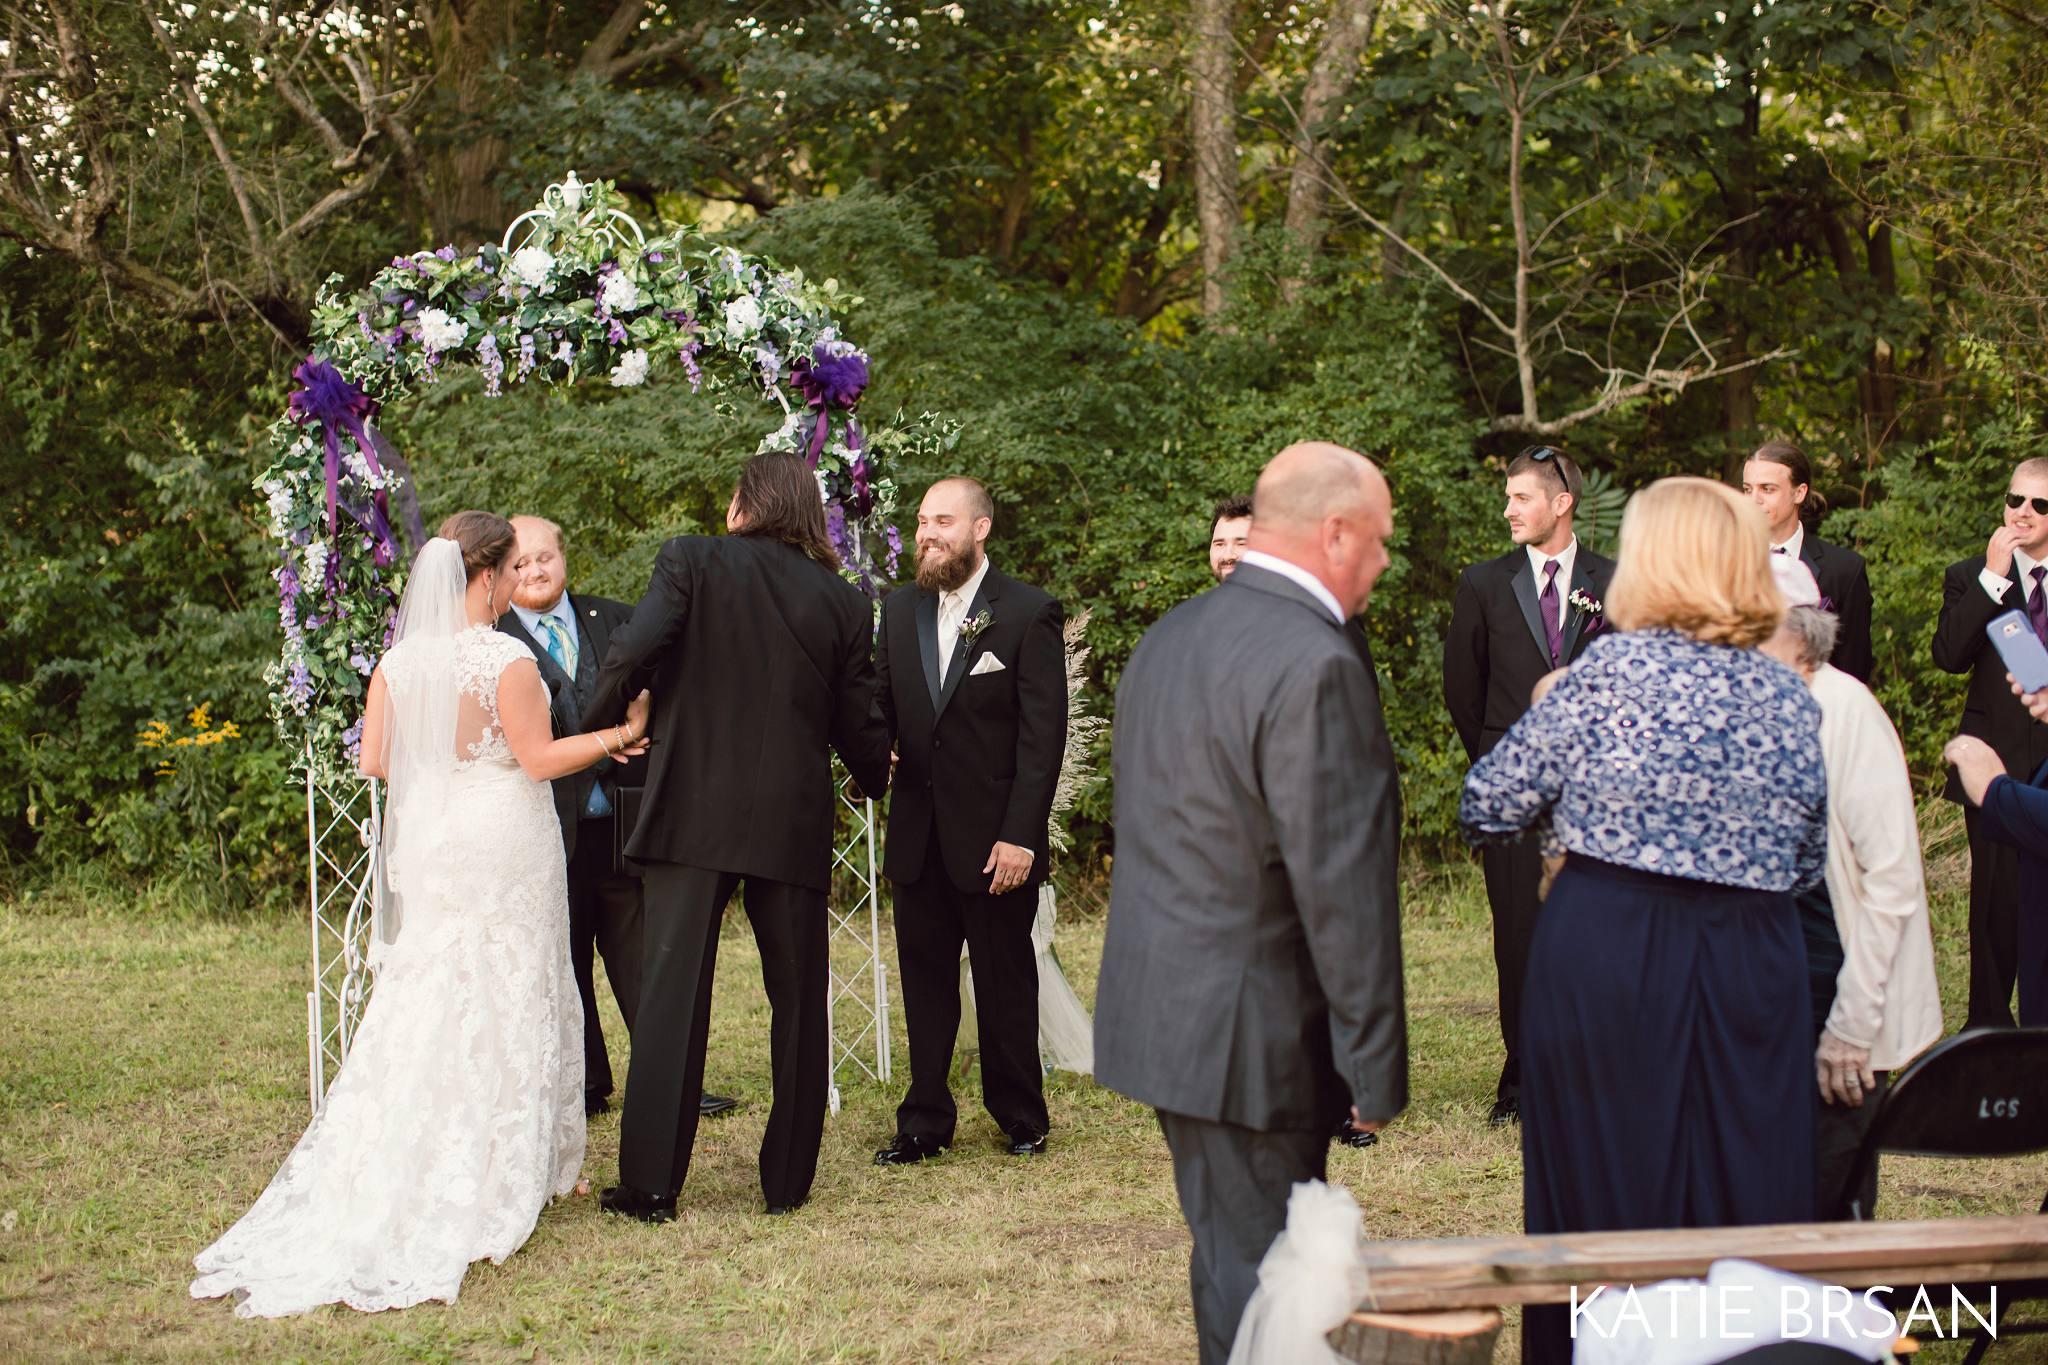 KatieBrsan-Bonfield-Backyard-Wedding_0403.jpg